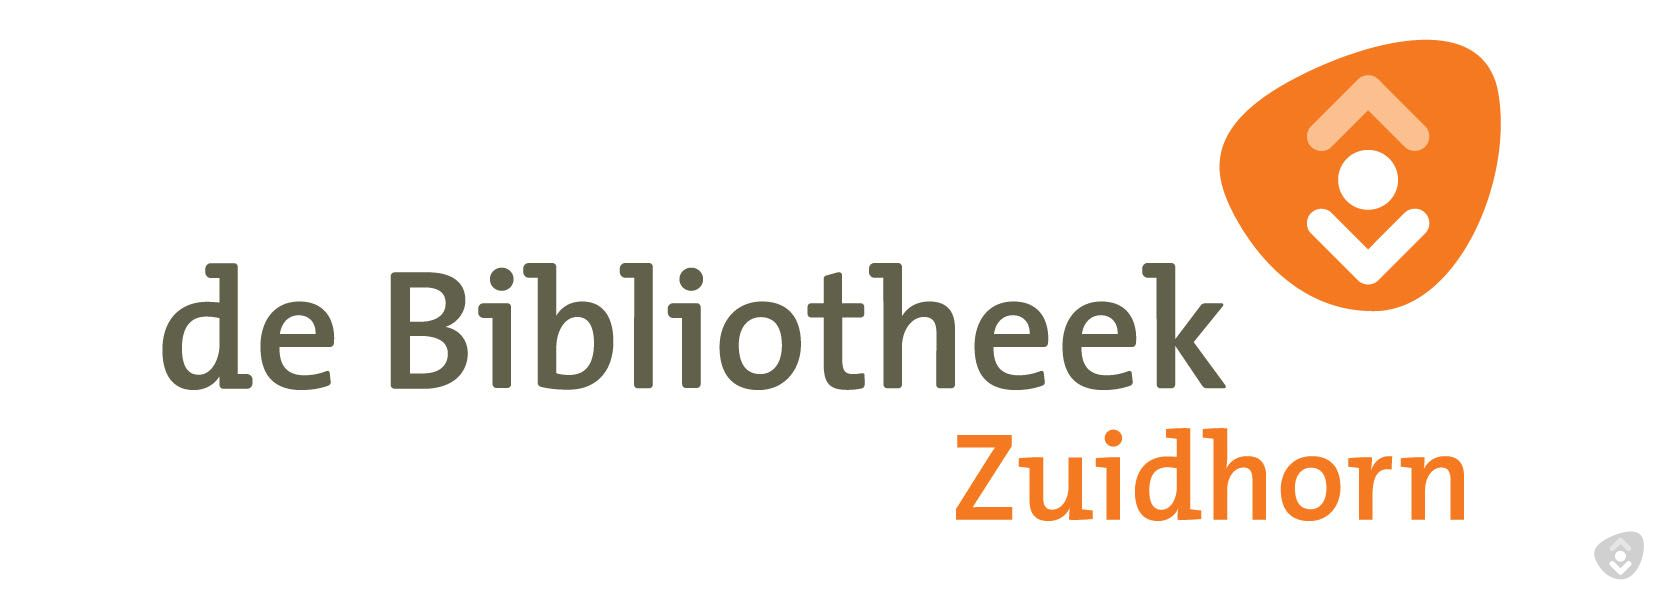 Biblio_lang_RGB_Zuidhorn.jpg (48645 bytes)